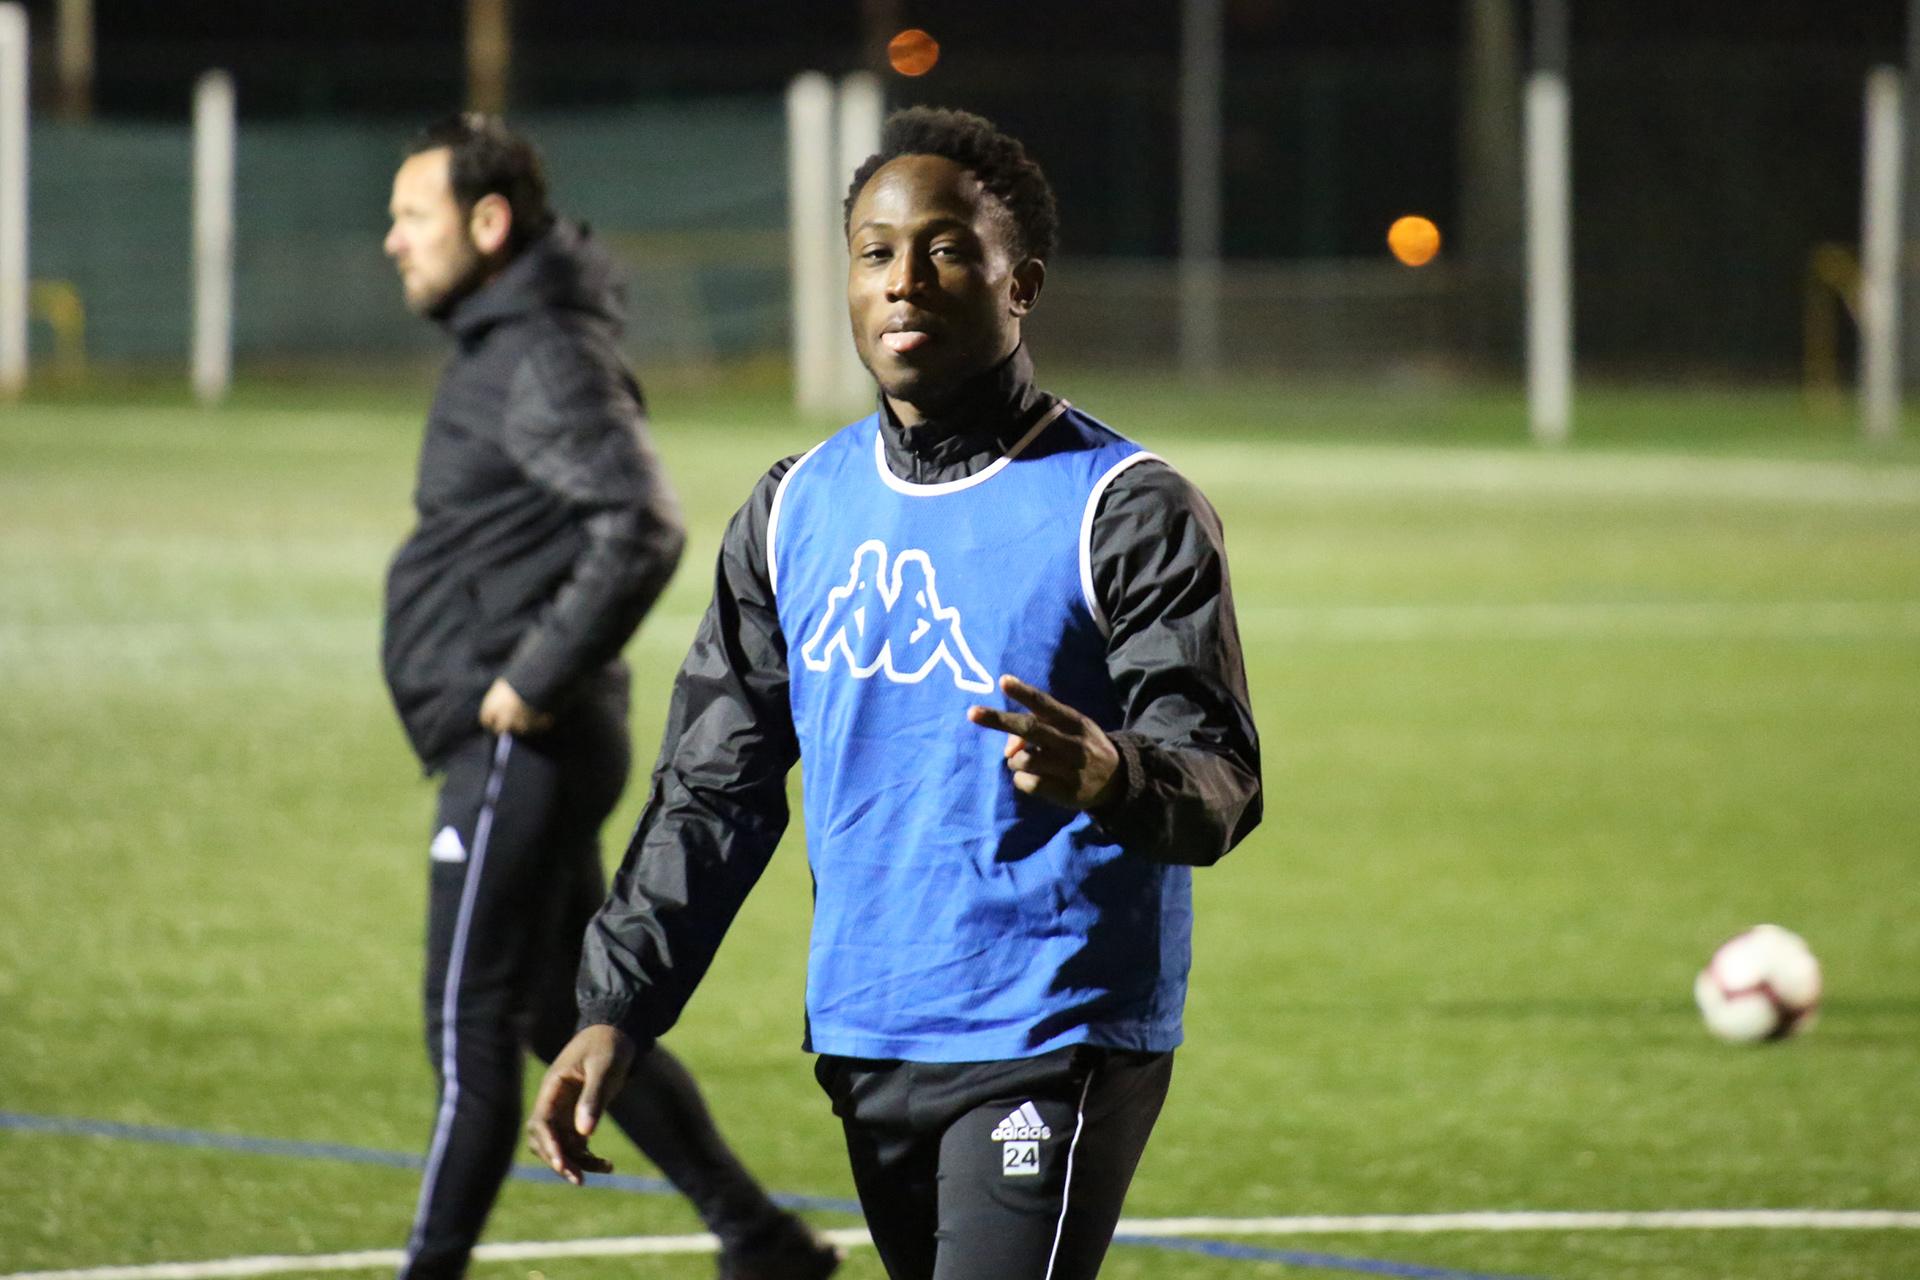 Moussaxdiaby